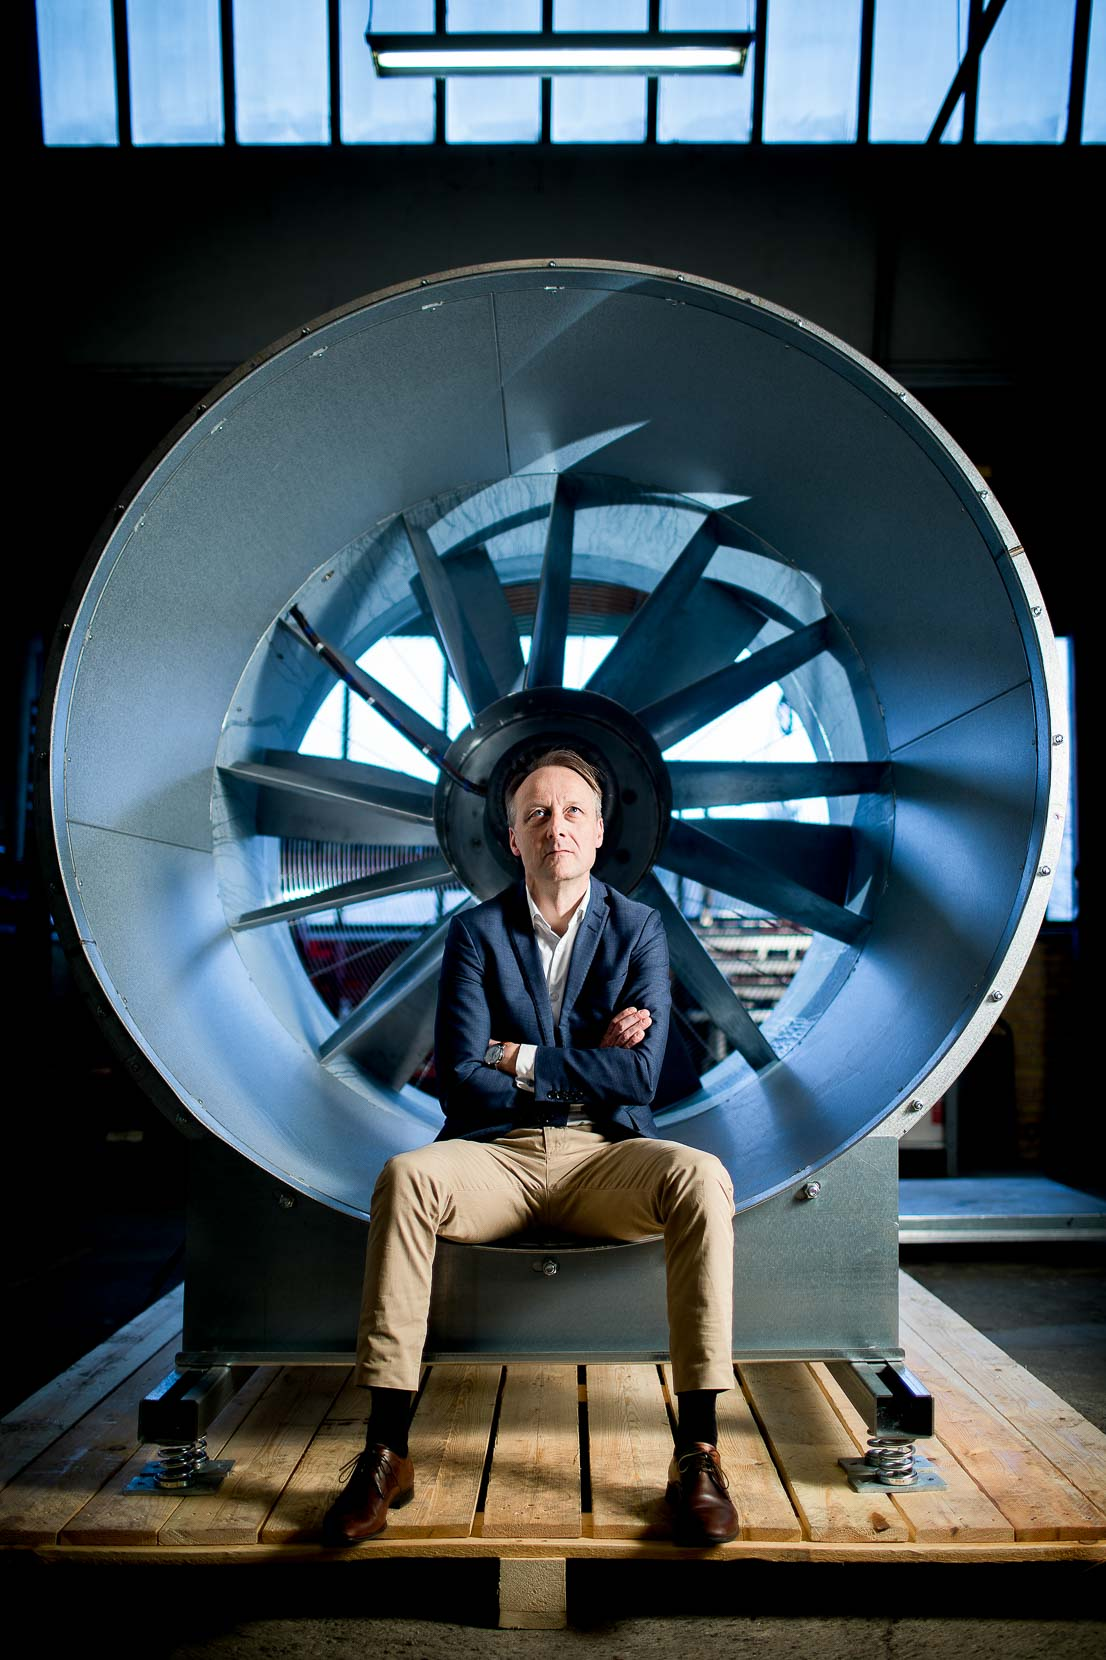 Lars Knaack, Adm. dir. Novenco Building and Industry.